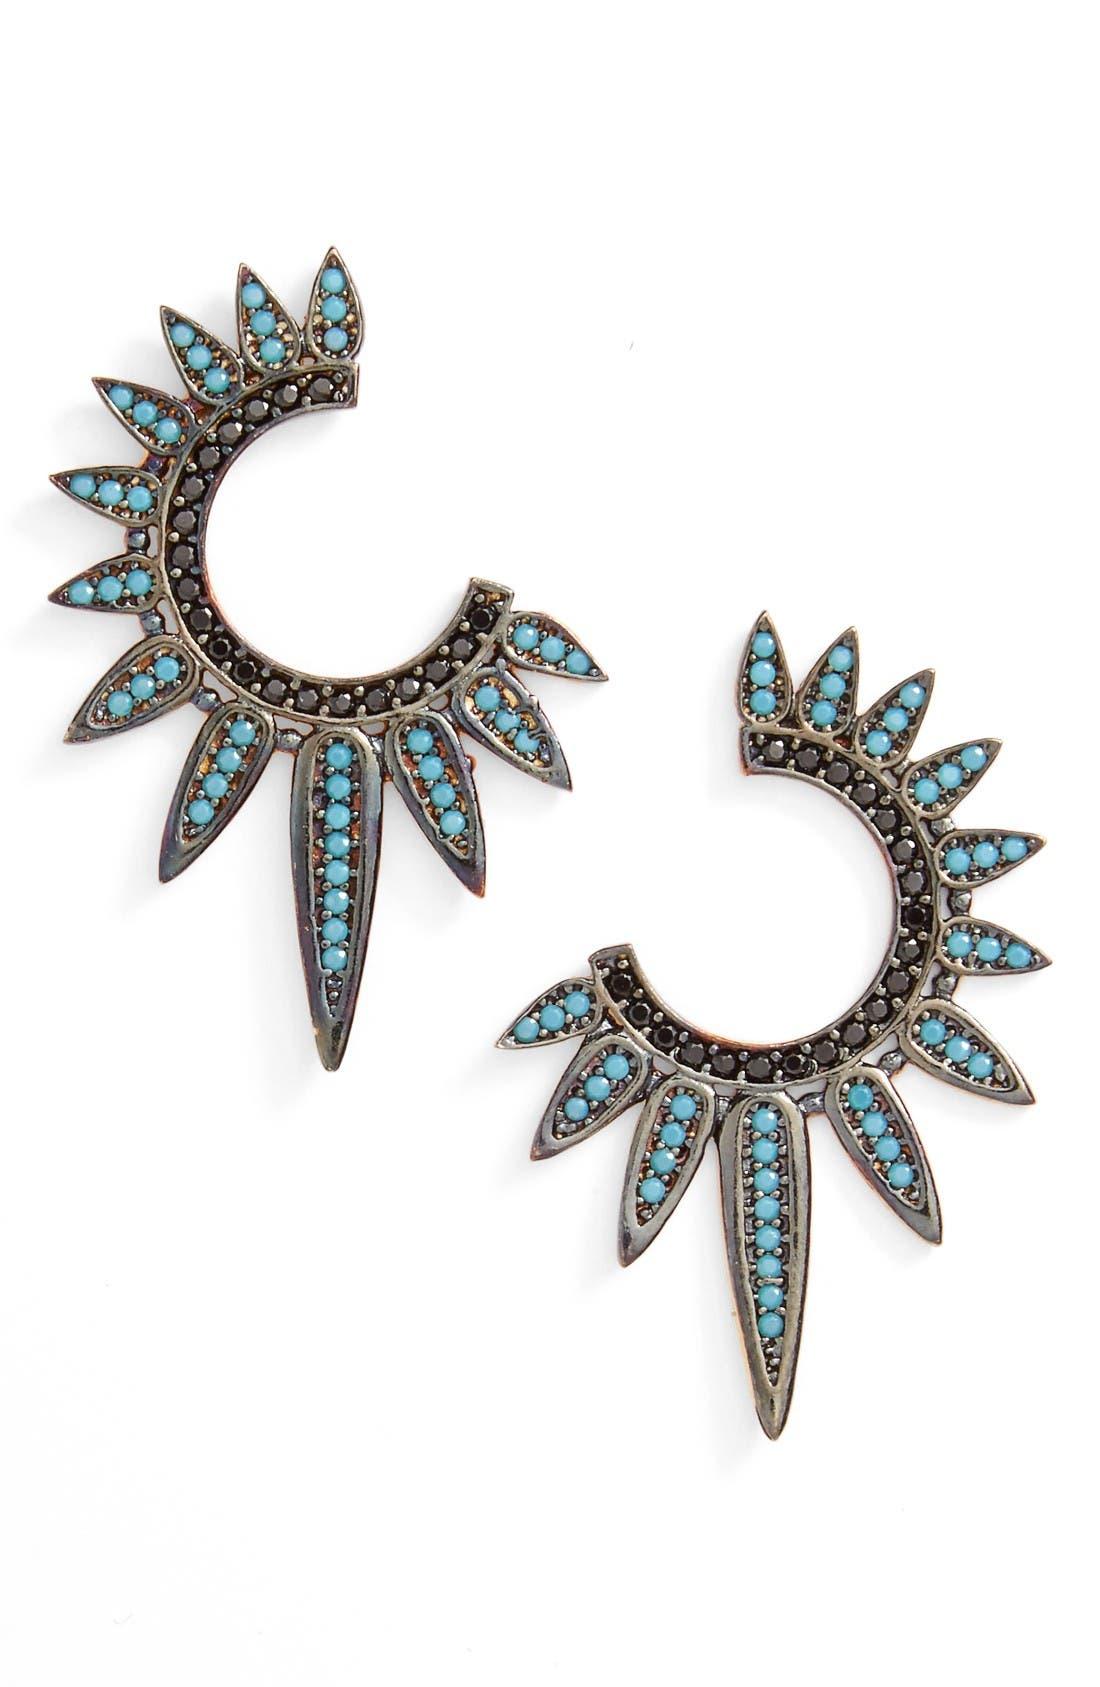 KAREN LONDON Obviously Amazing Earrings